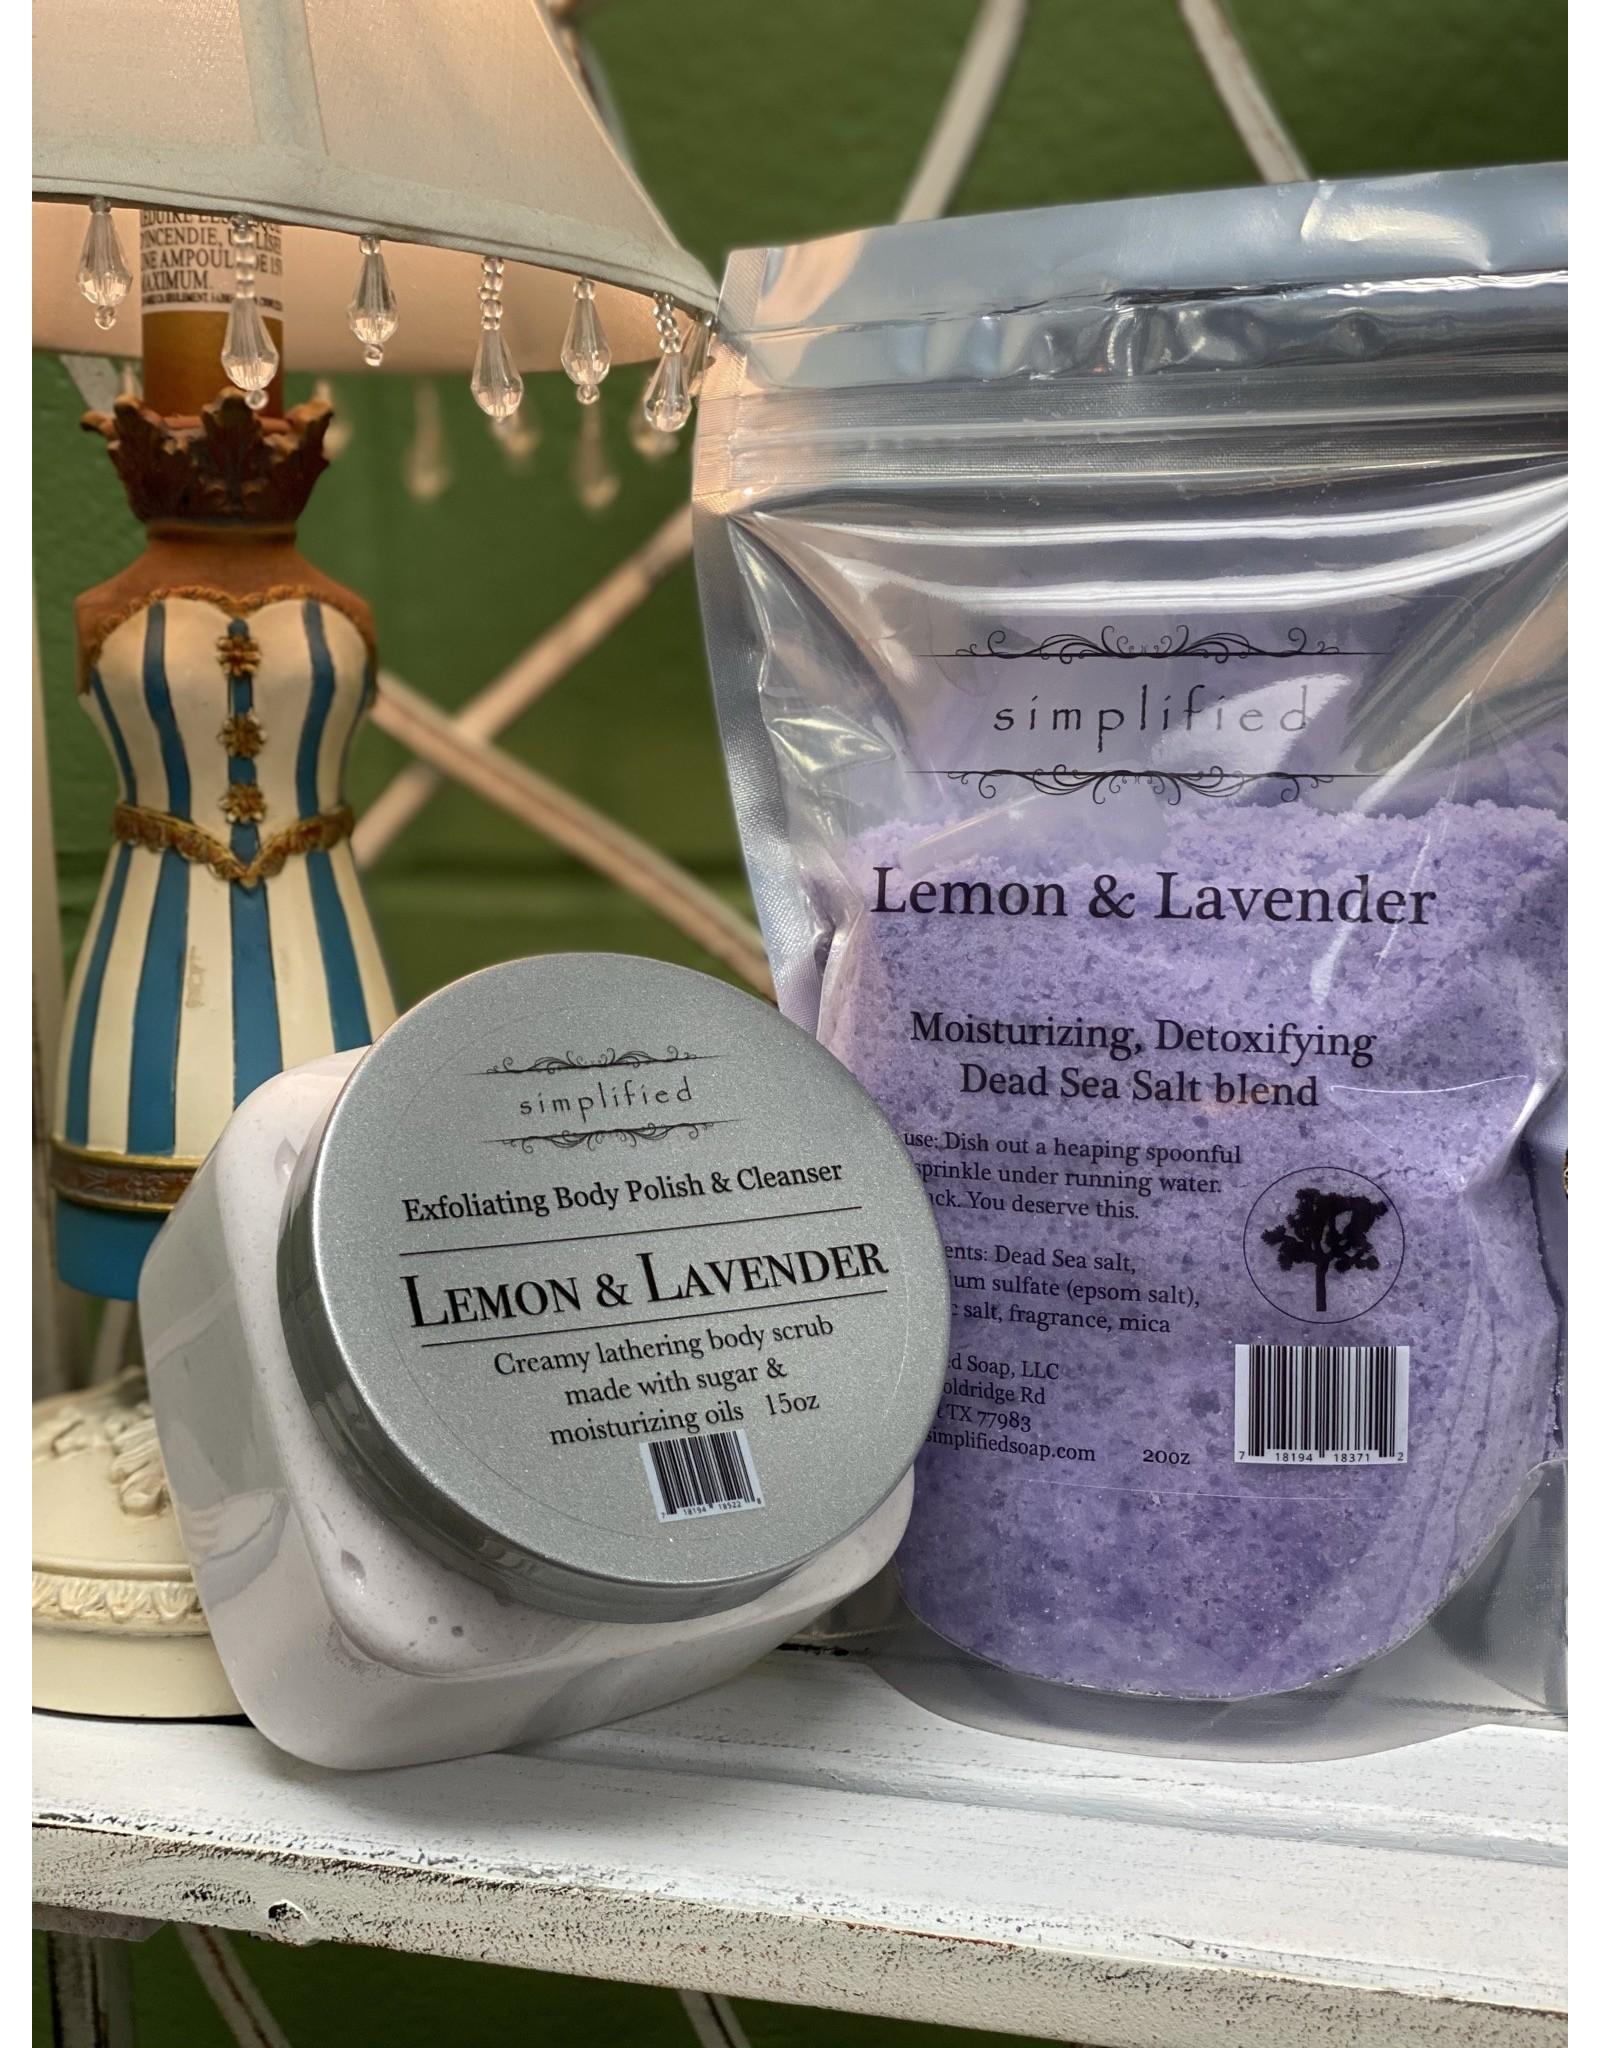 Lemon & Lavender Dead Sea Salt Blend